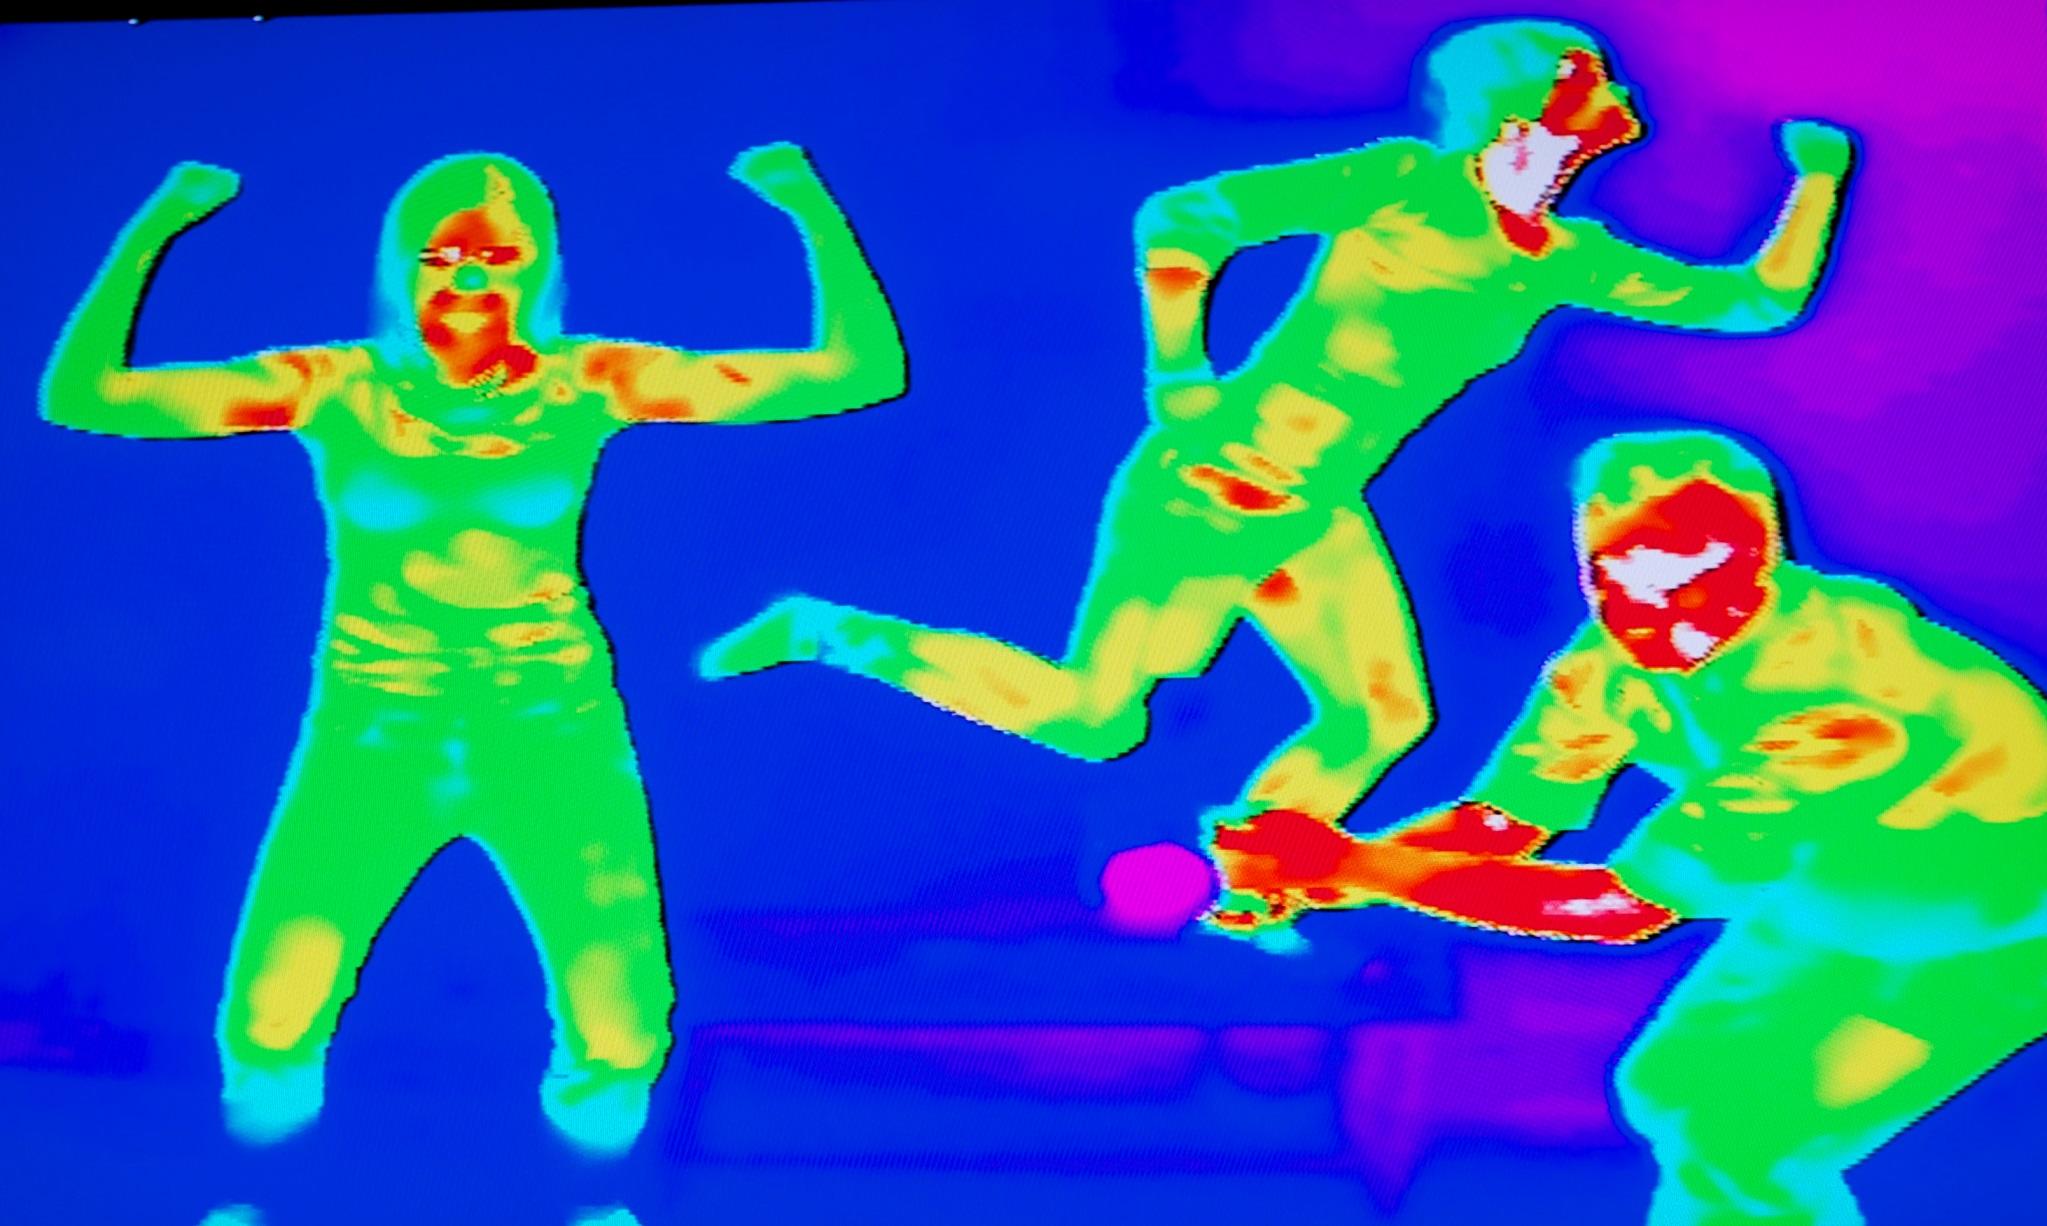 Thermal Camera, Eye Spy Edinburgh at Camera Obscura & World of Illusions